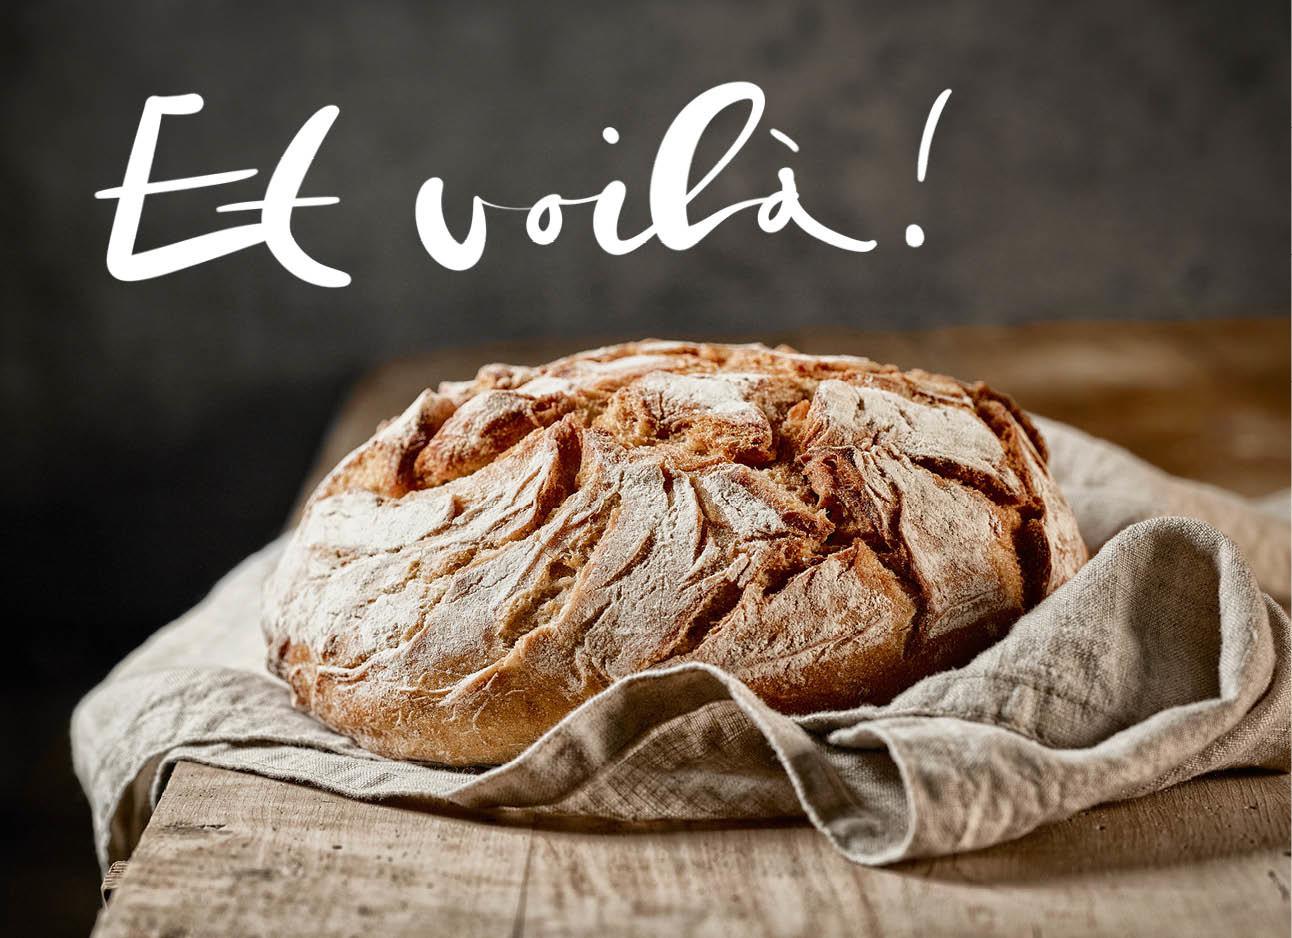 Dit recept voor pindakaasbrood gaat viral